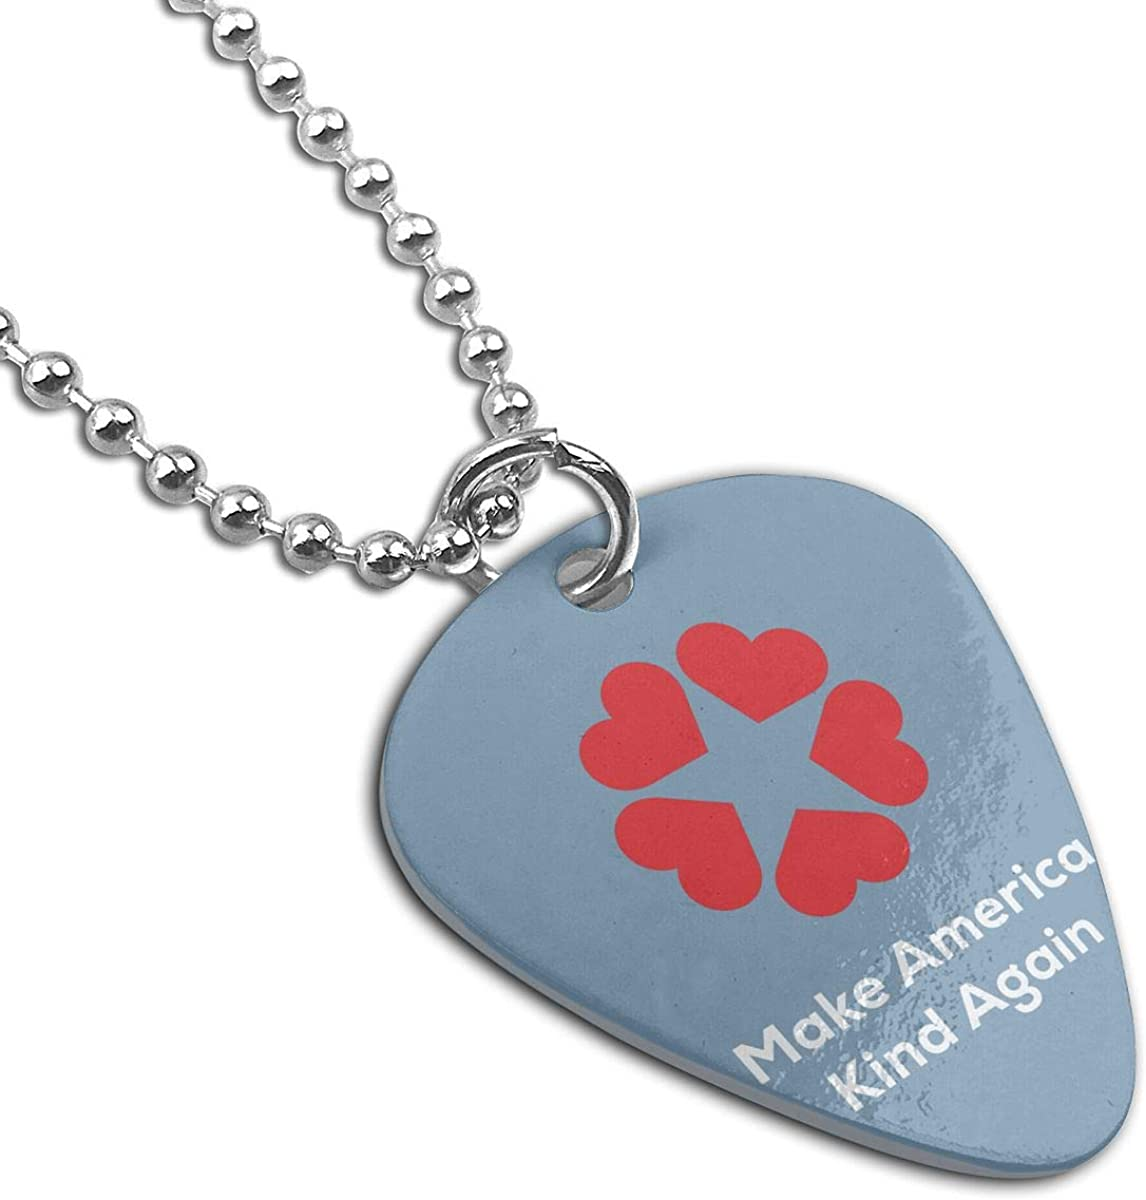 Make America Kind Again Guitar Pick Necklace Unique Custom Fashion Pet Card Keychain